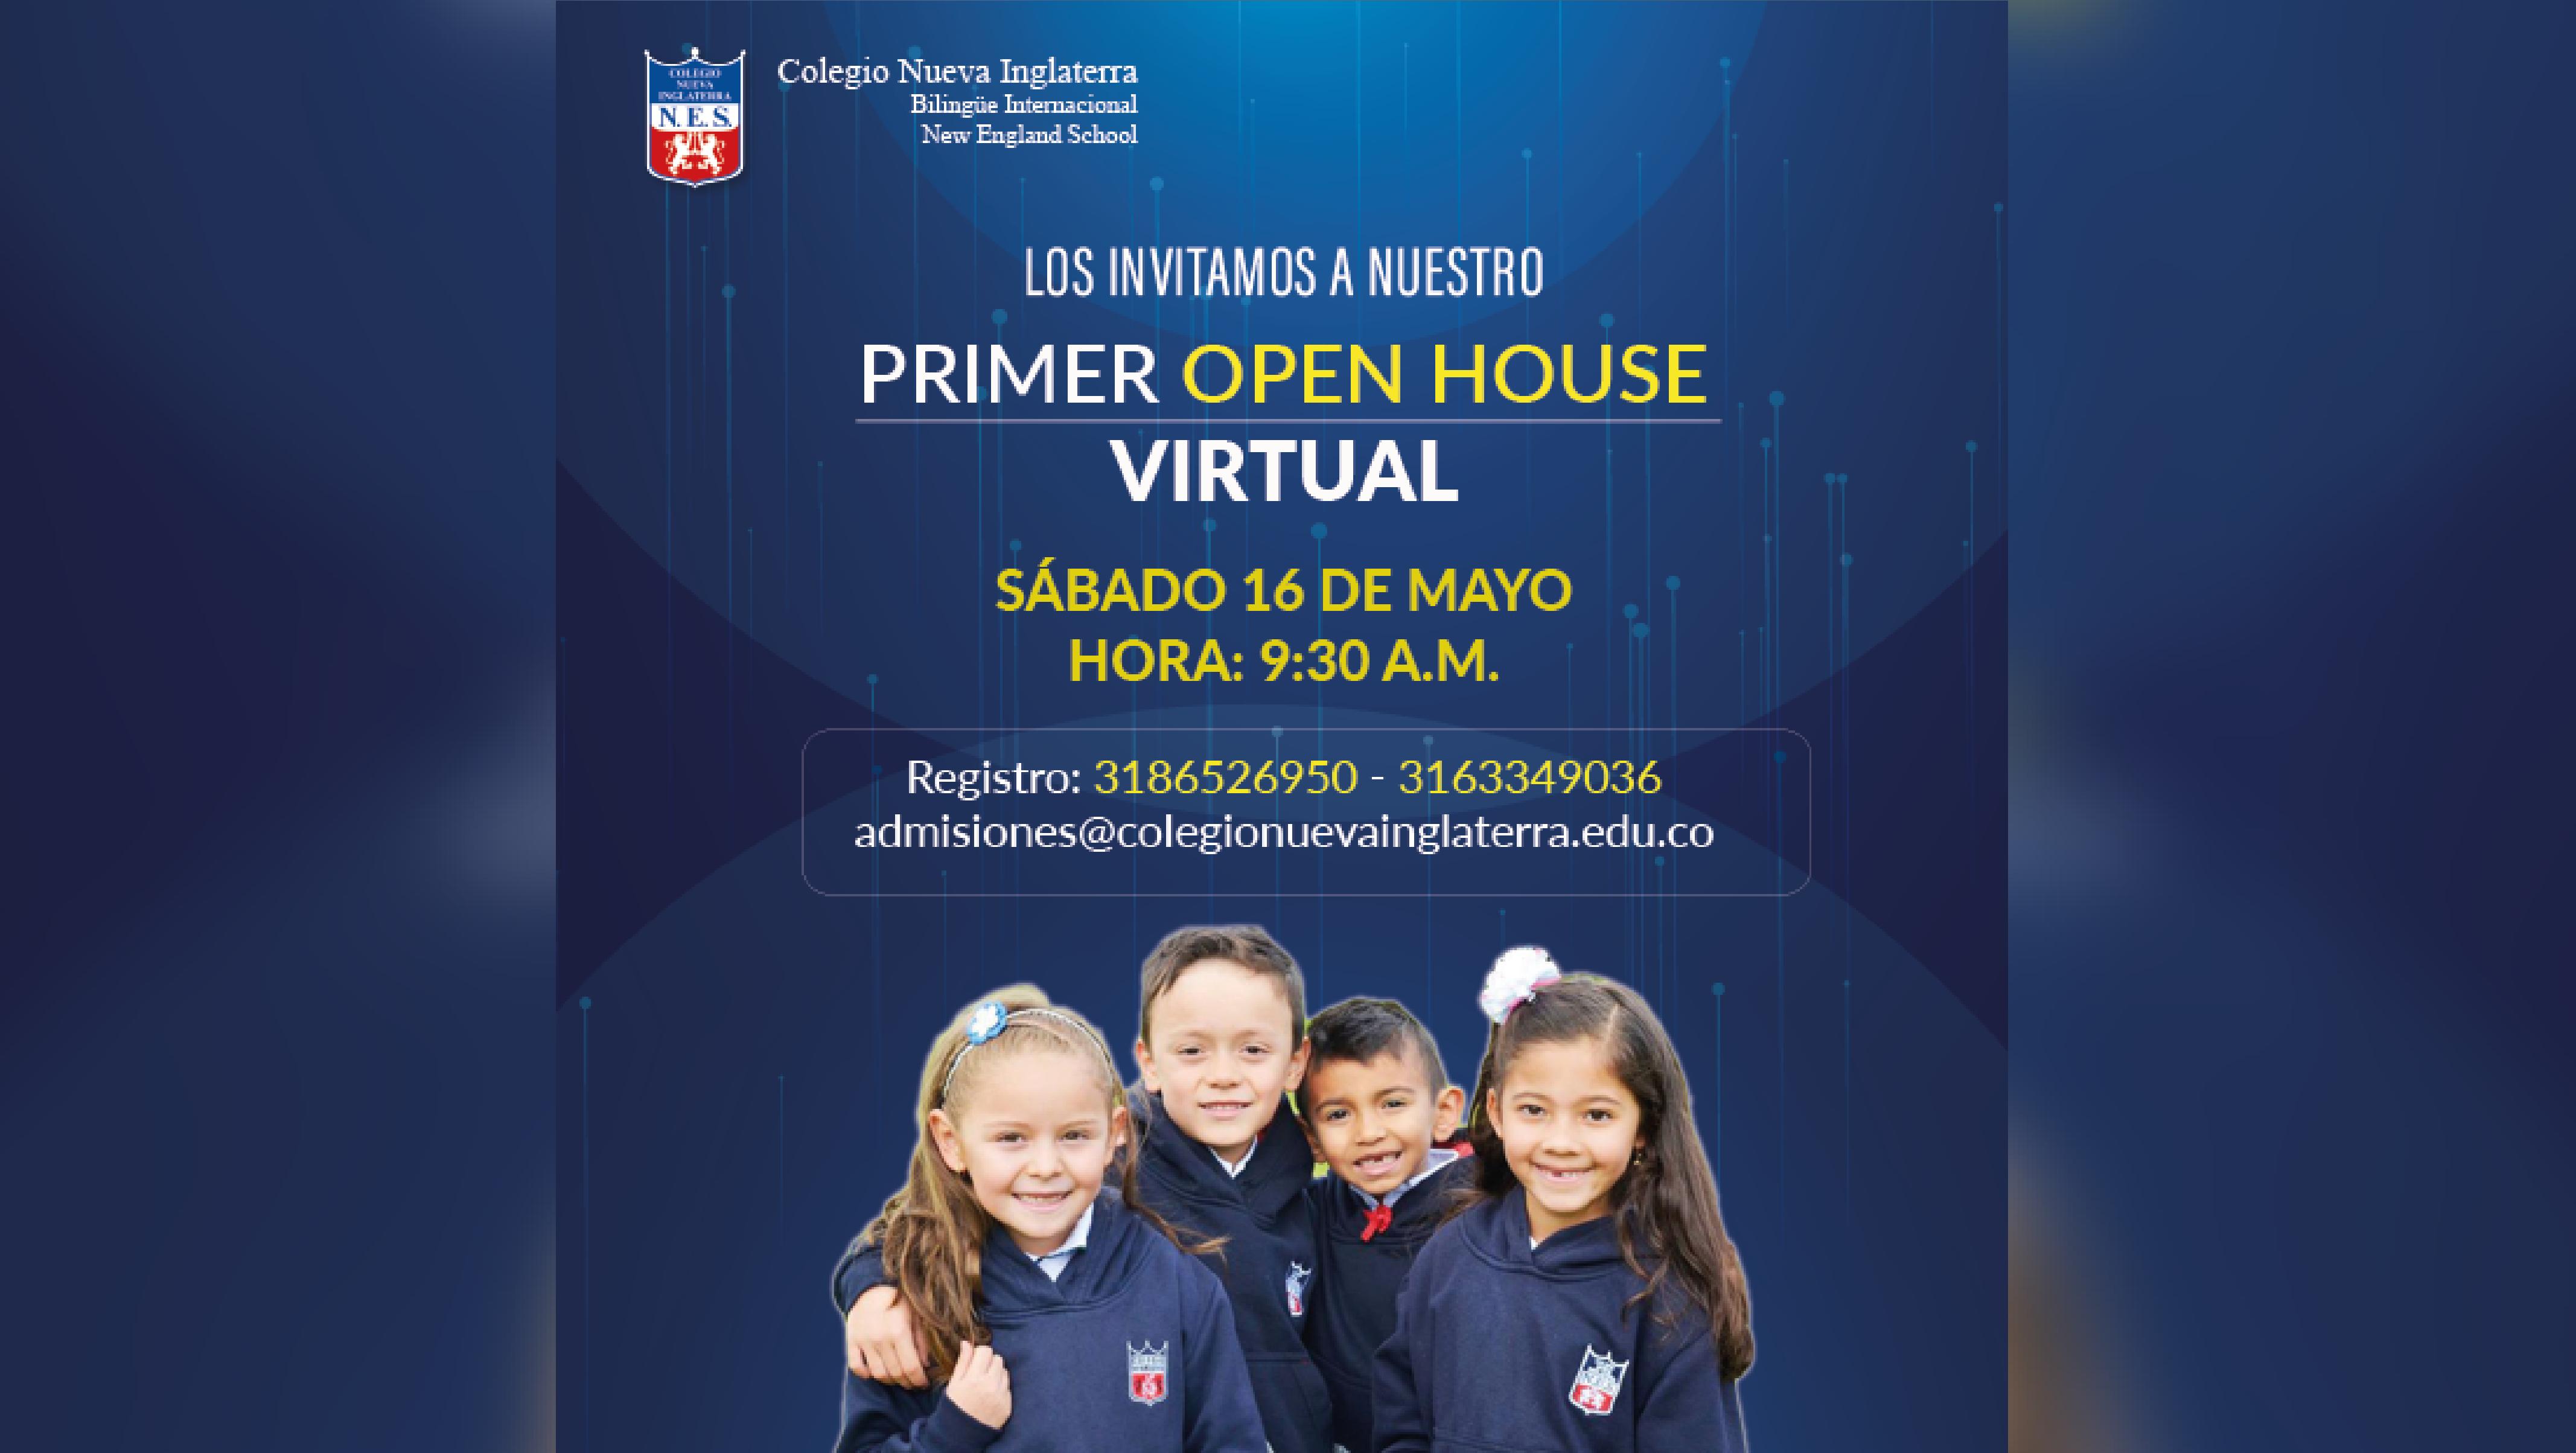 Gimnasio-Nueva-Inglaterra-Colegio-Bogota-Open-House-Virtual-01